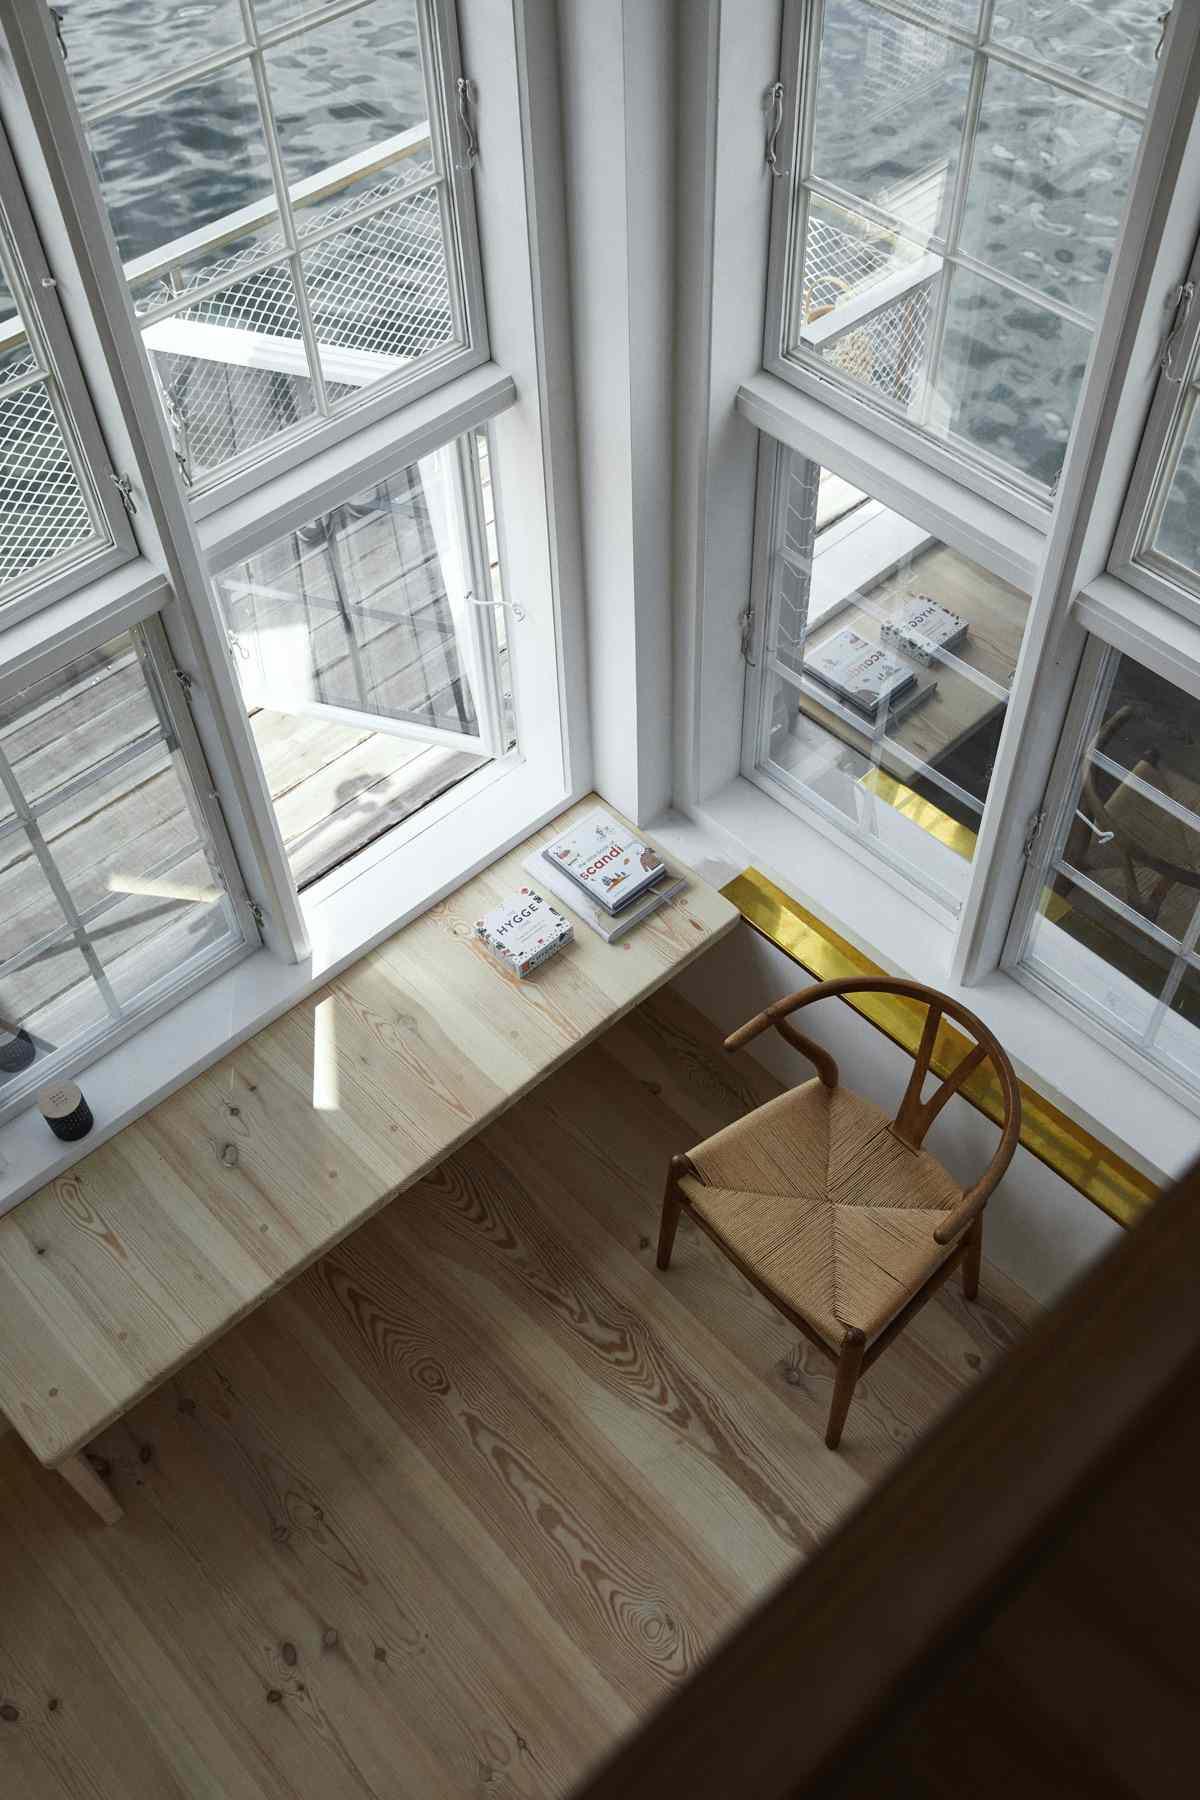 View down towards windows